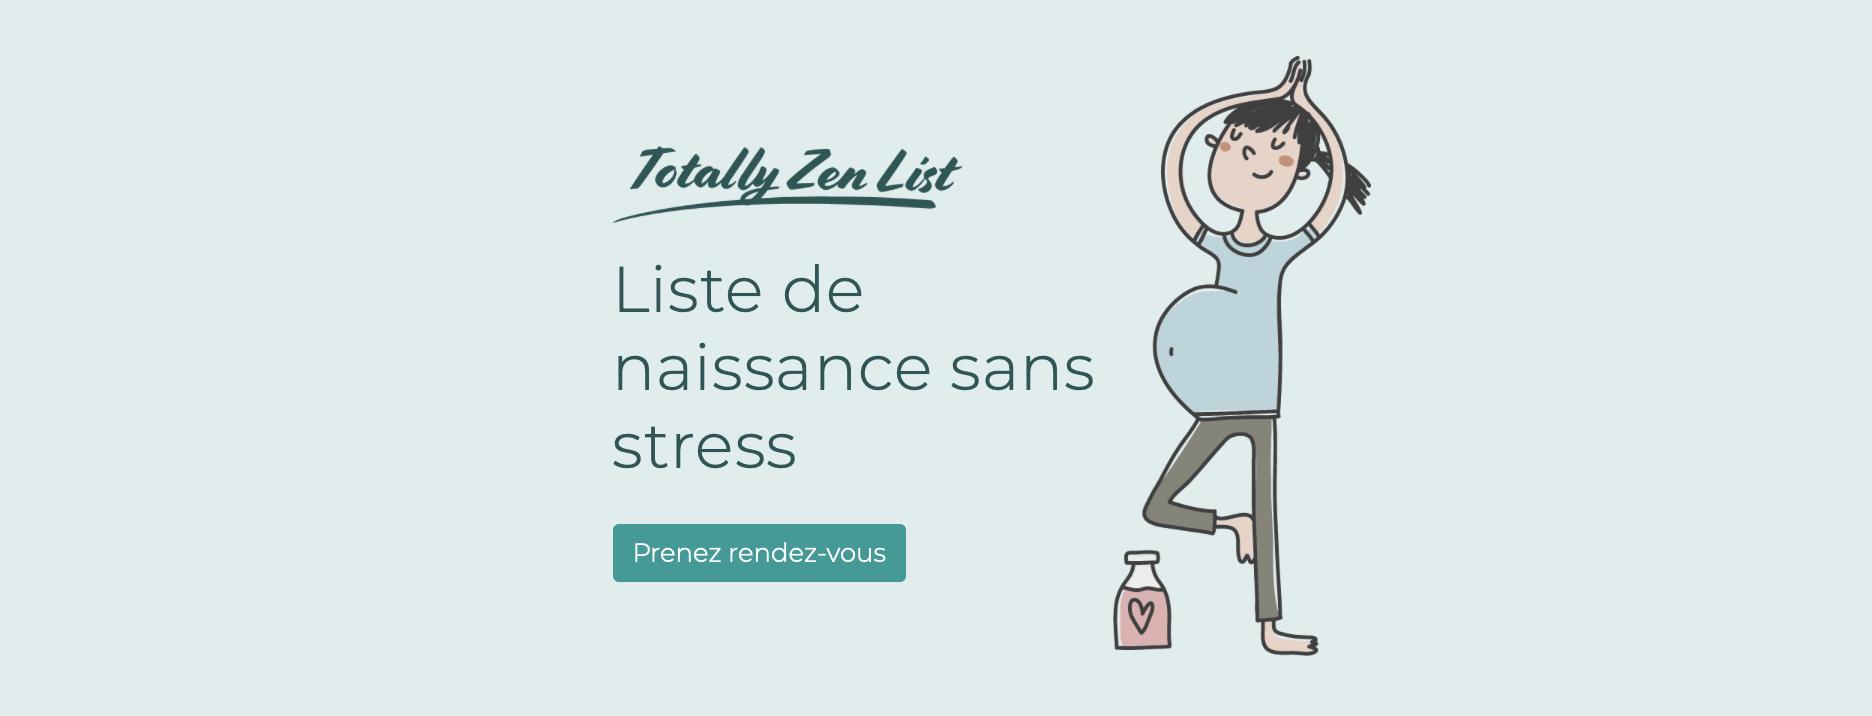 Totally Zen List